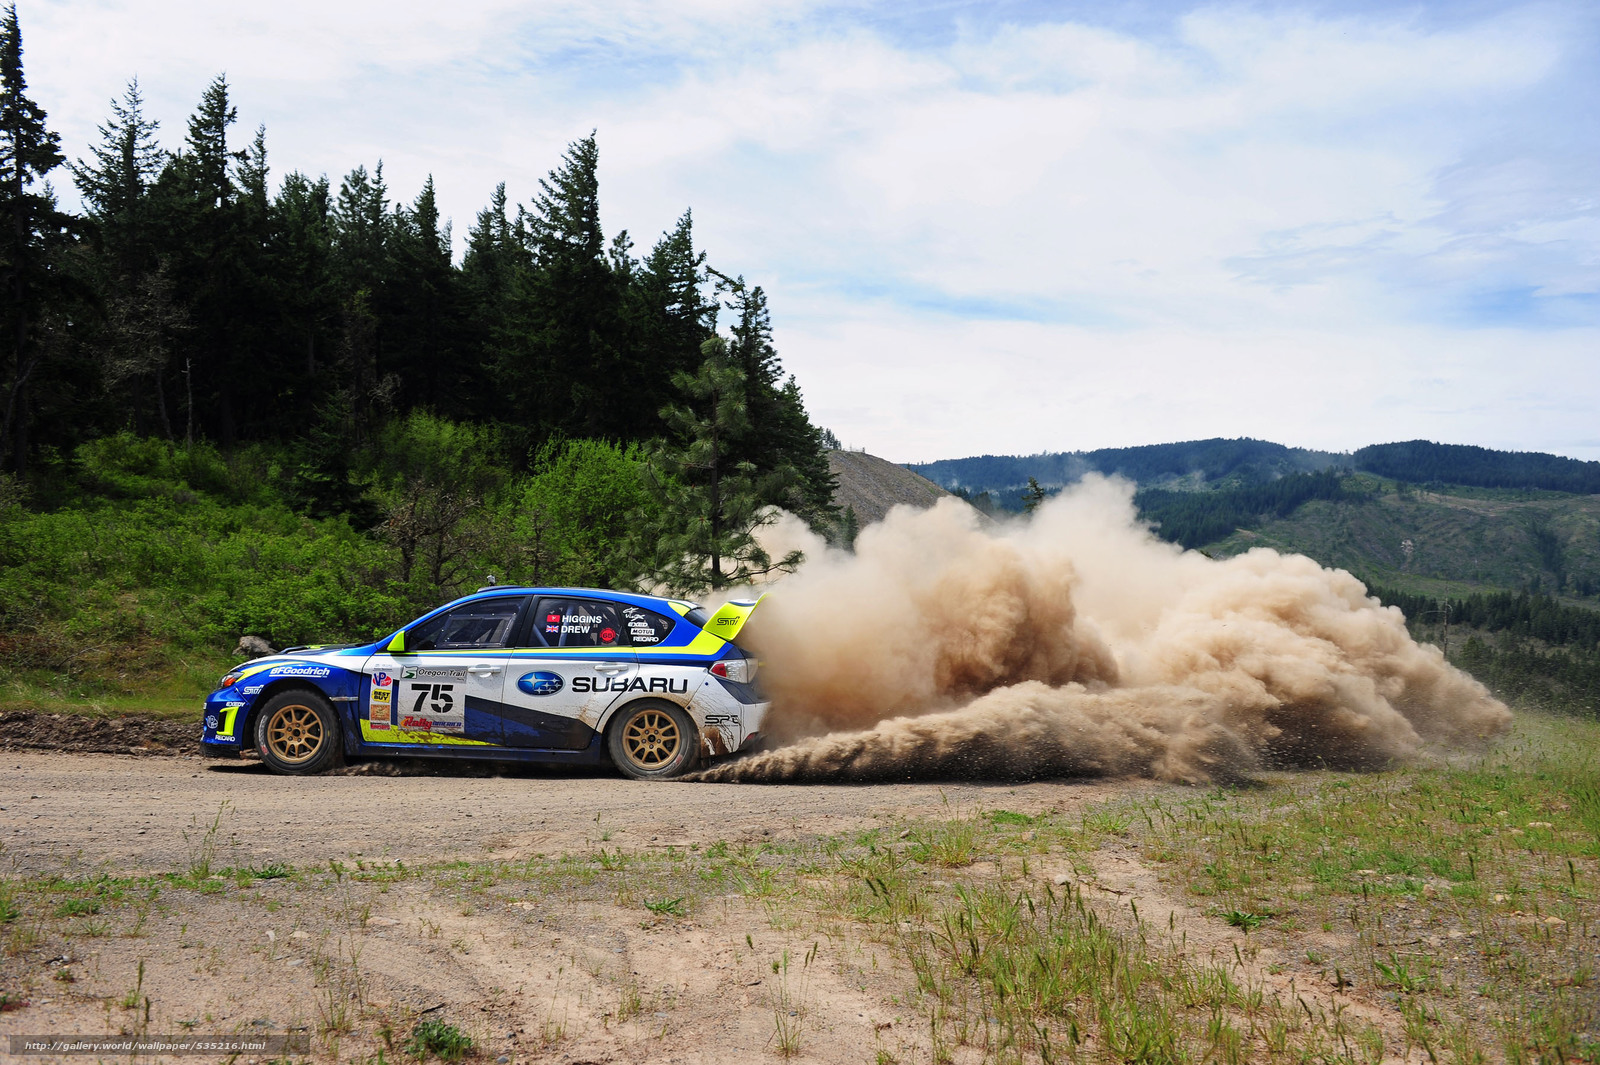 Baixar Wallpaper Subaru,  Esporte,  Corrida,  Carro Papis de parede grtis na resoluo 2700x1797 — quadro №535216